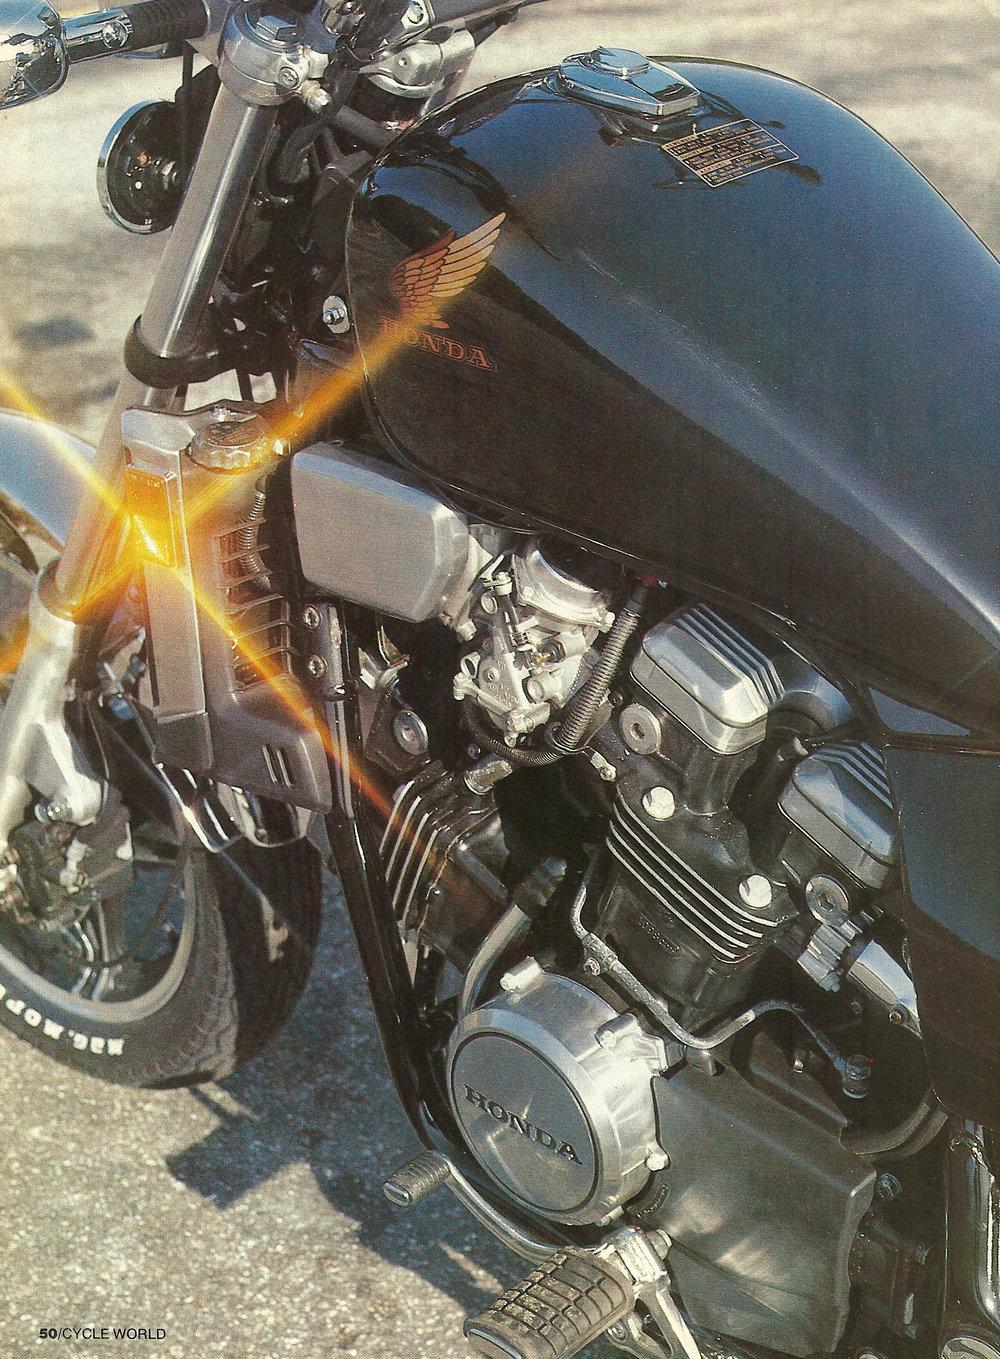 1983 Honda V65 Magna 03.jpg